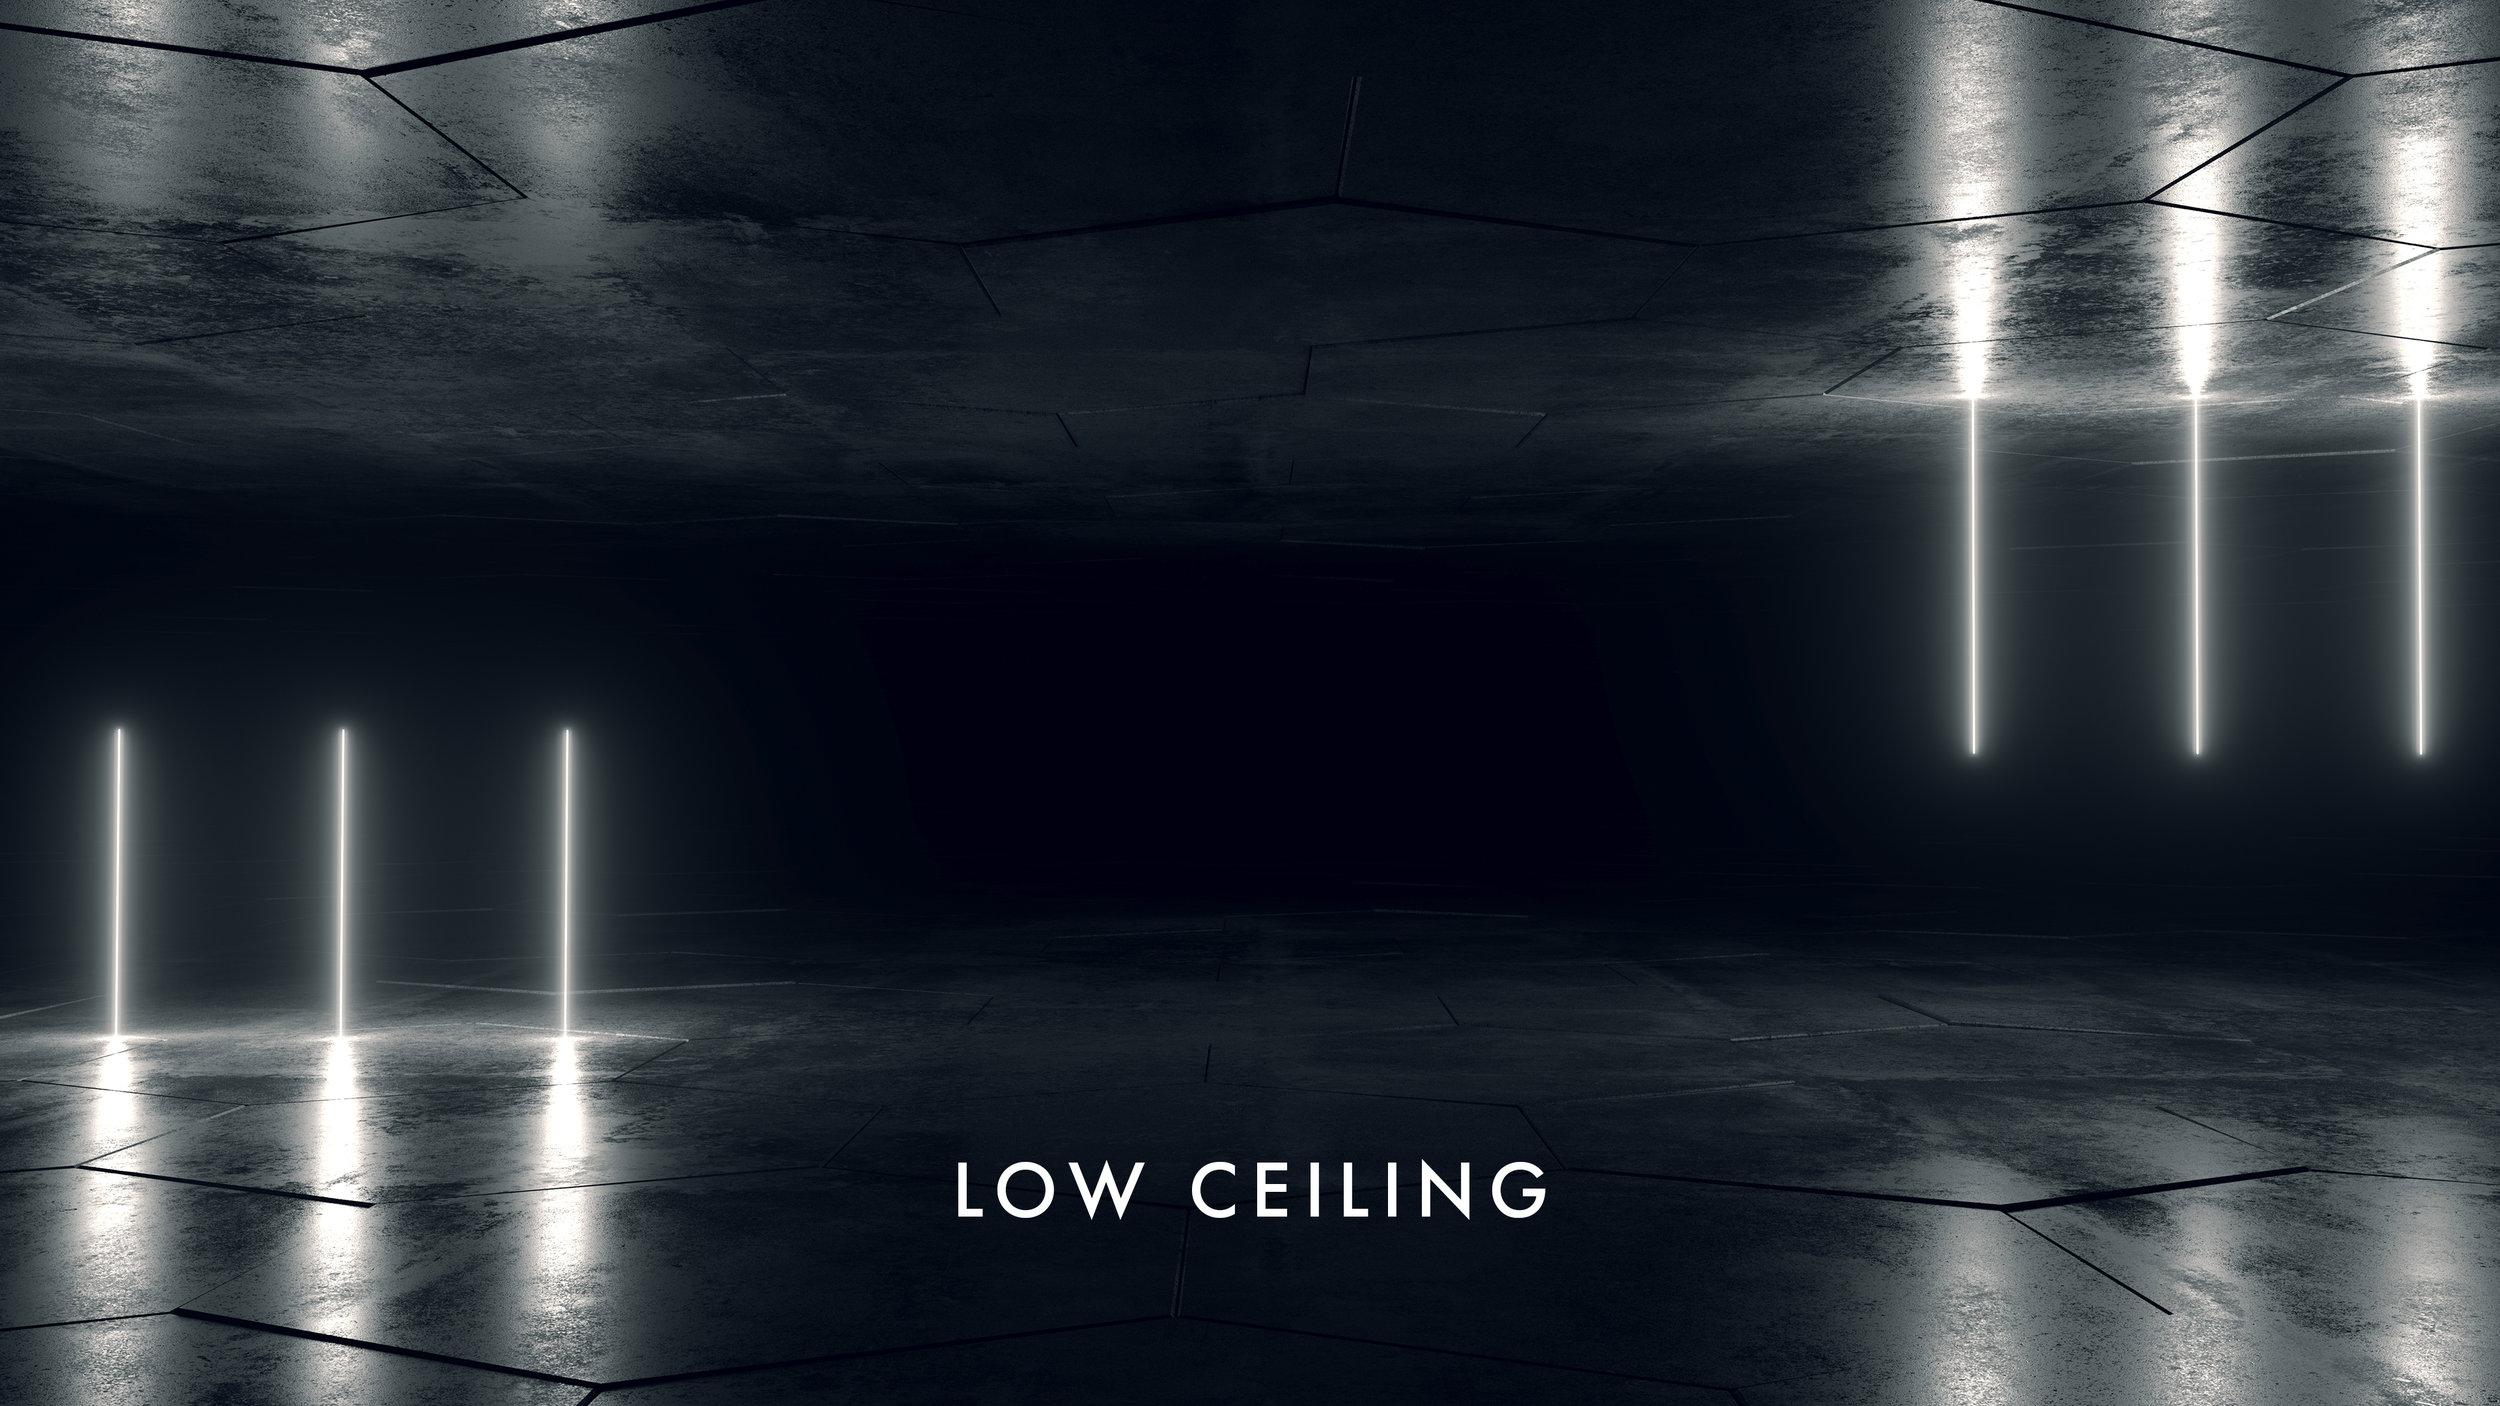 LOW CEILING WALLPAPER3.jpg